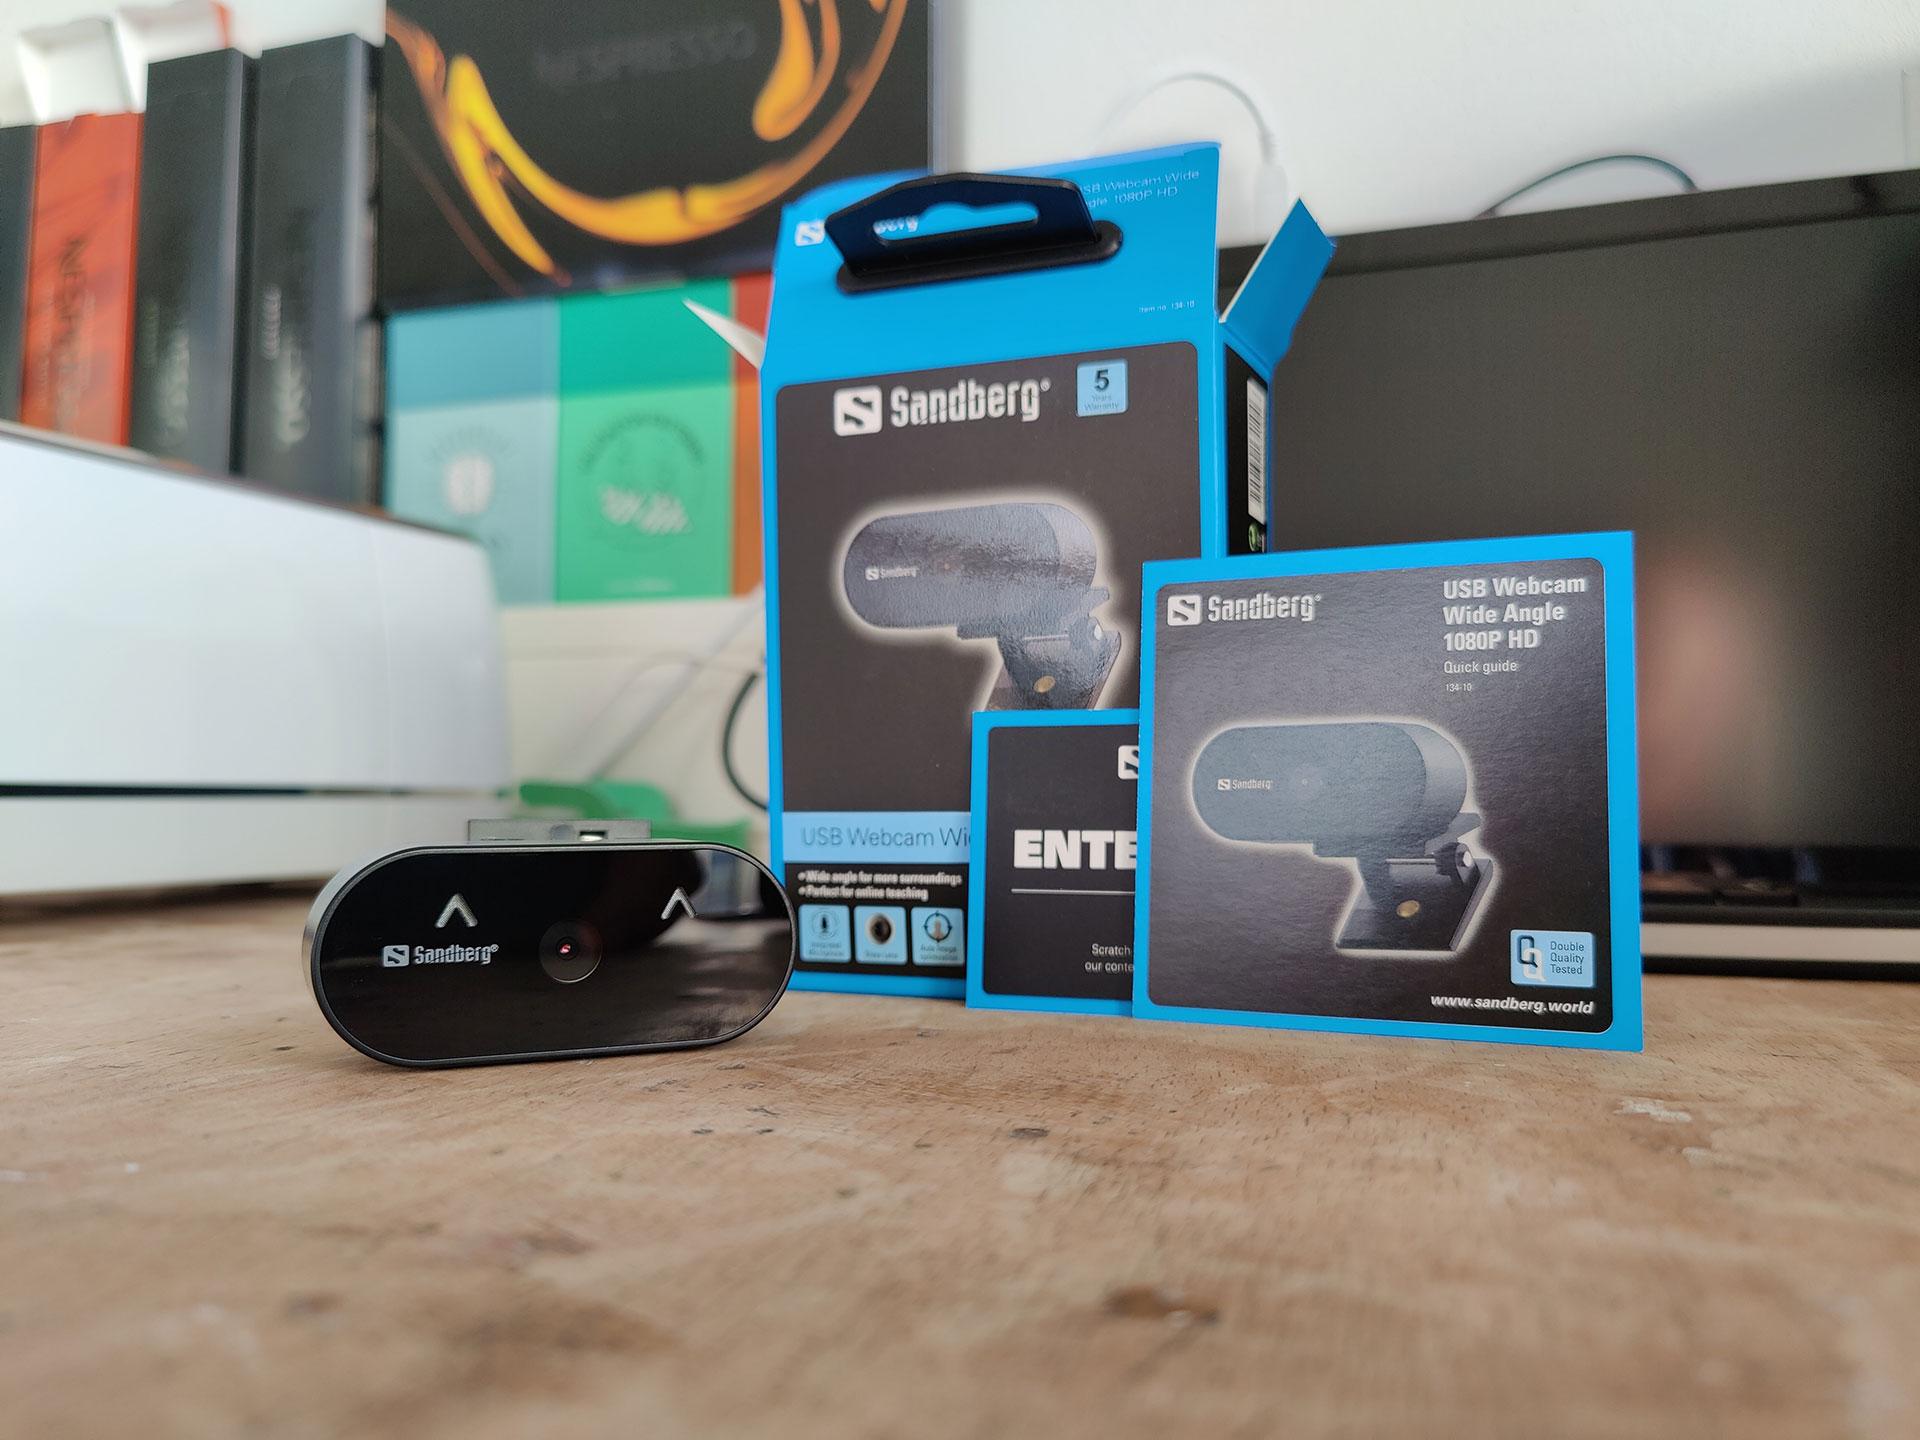 De Sandberg USB Webcam Wide Angle 1080P HD uitgepakt